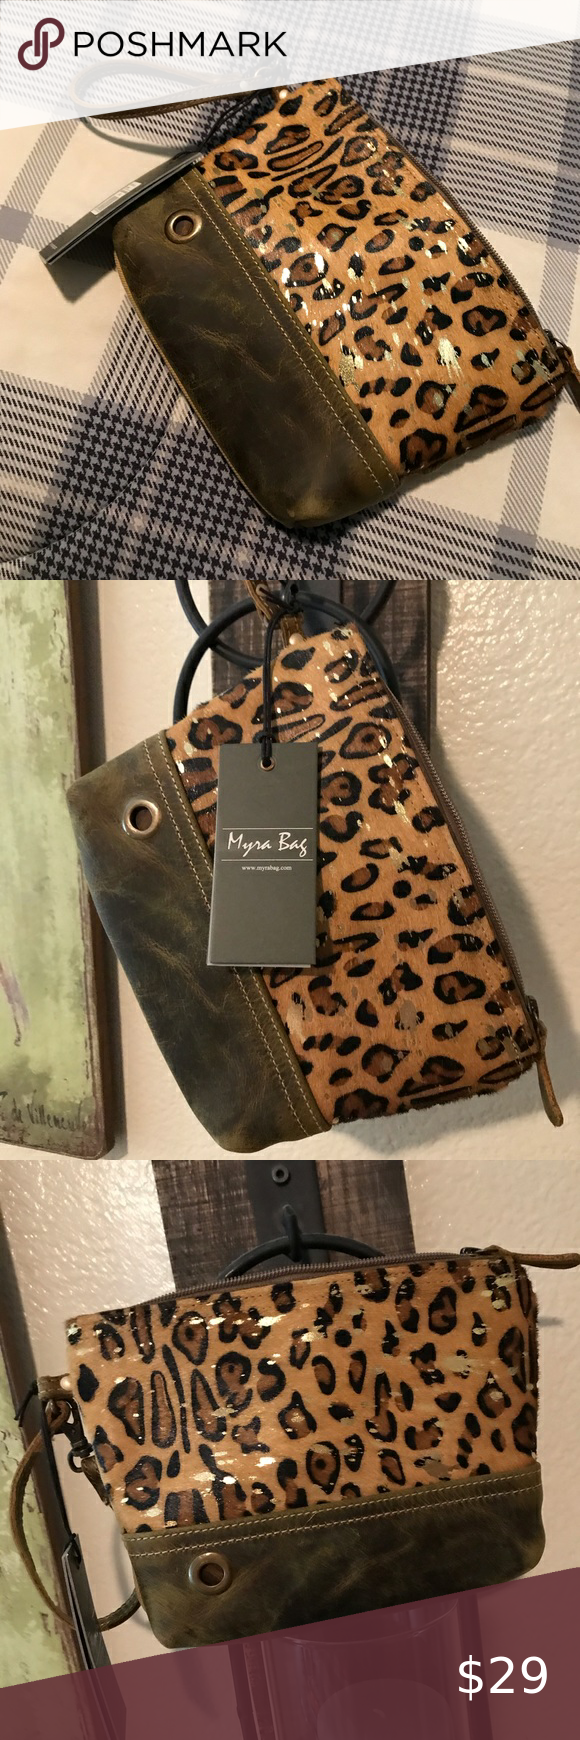 New Myra Leopard Makeup Clutch Bag Leather Gold In 2020 Clutch Bag Purses And Handbags Bags Последние твиты от myra bag (@myra_bag). pinterest